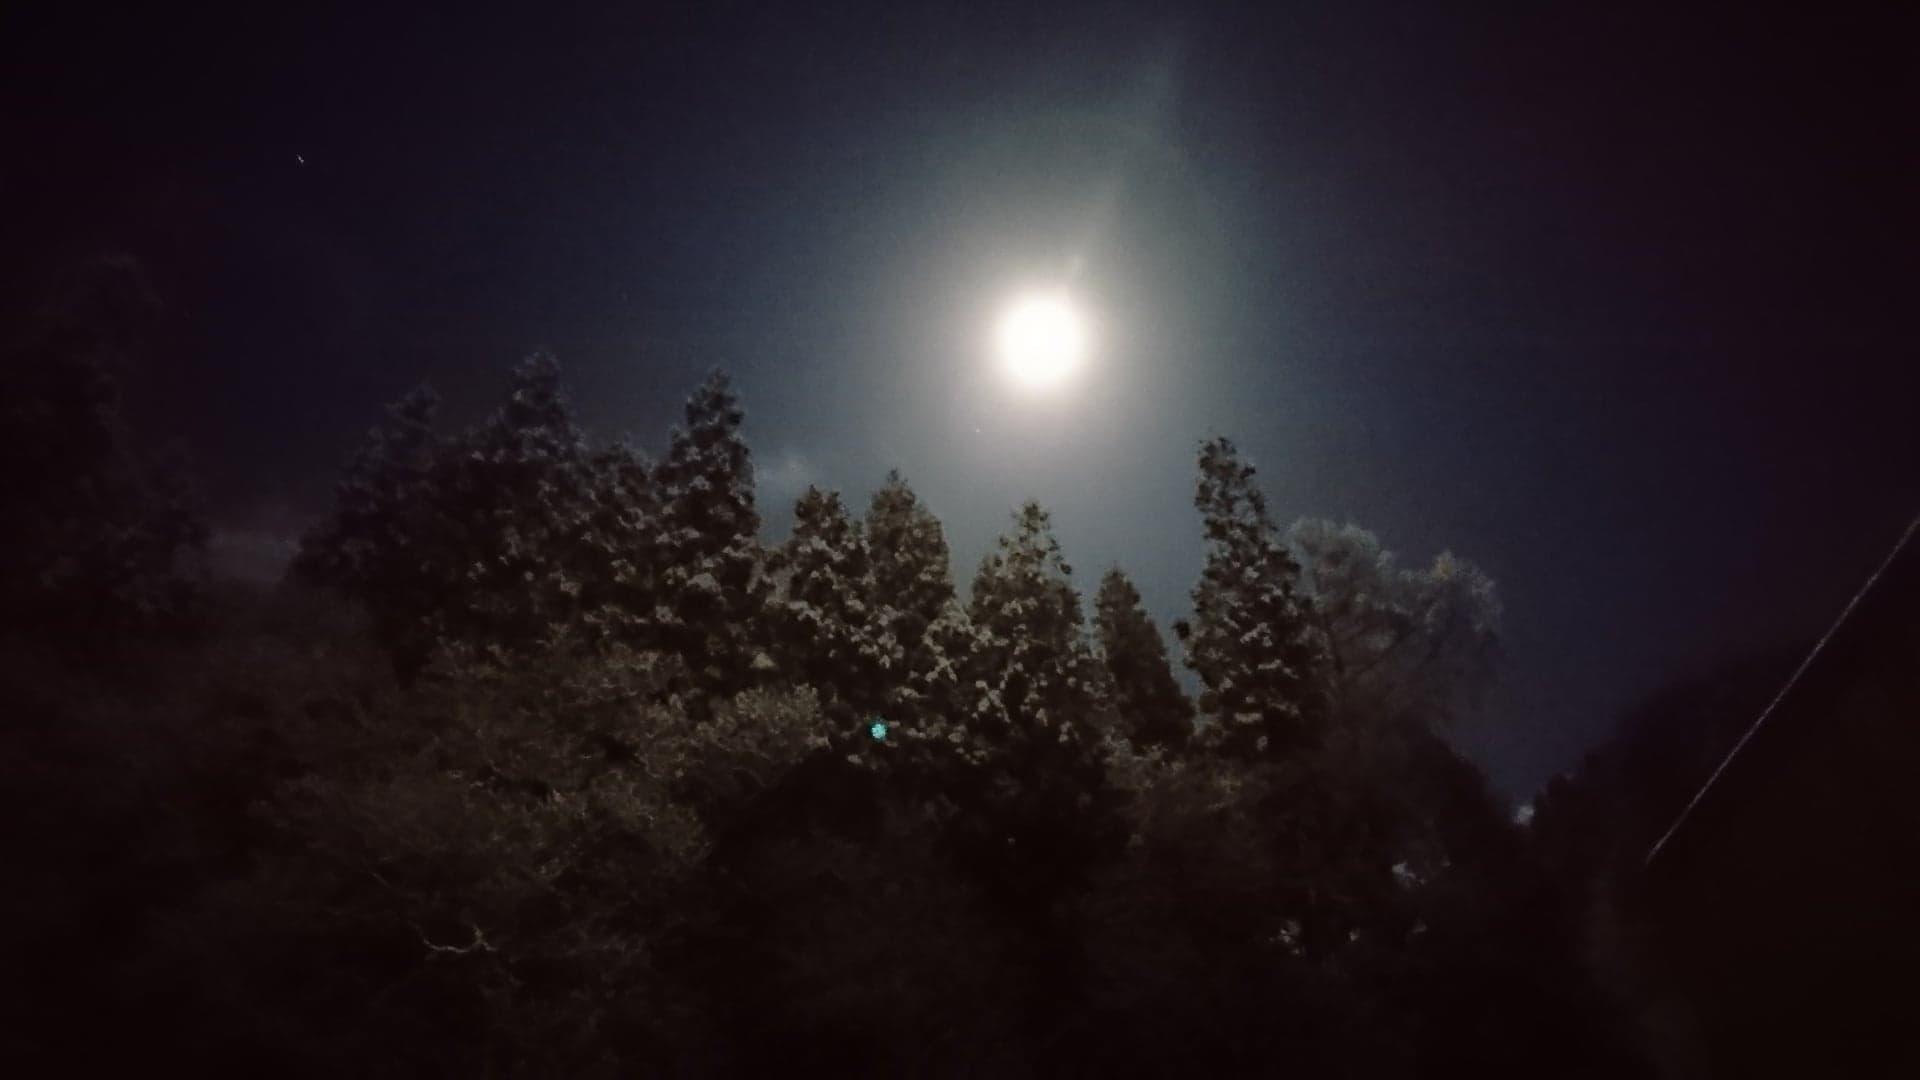 https://www.satoshoten.jp/blog/46521708_295709467725850_5803394402021801984_n.jpg